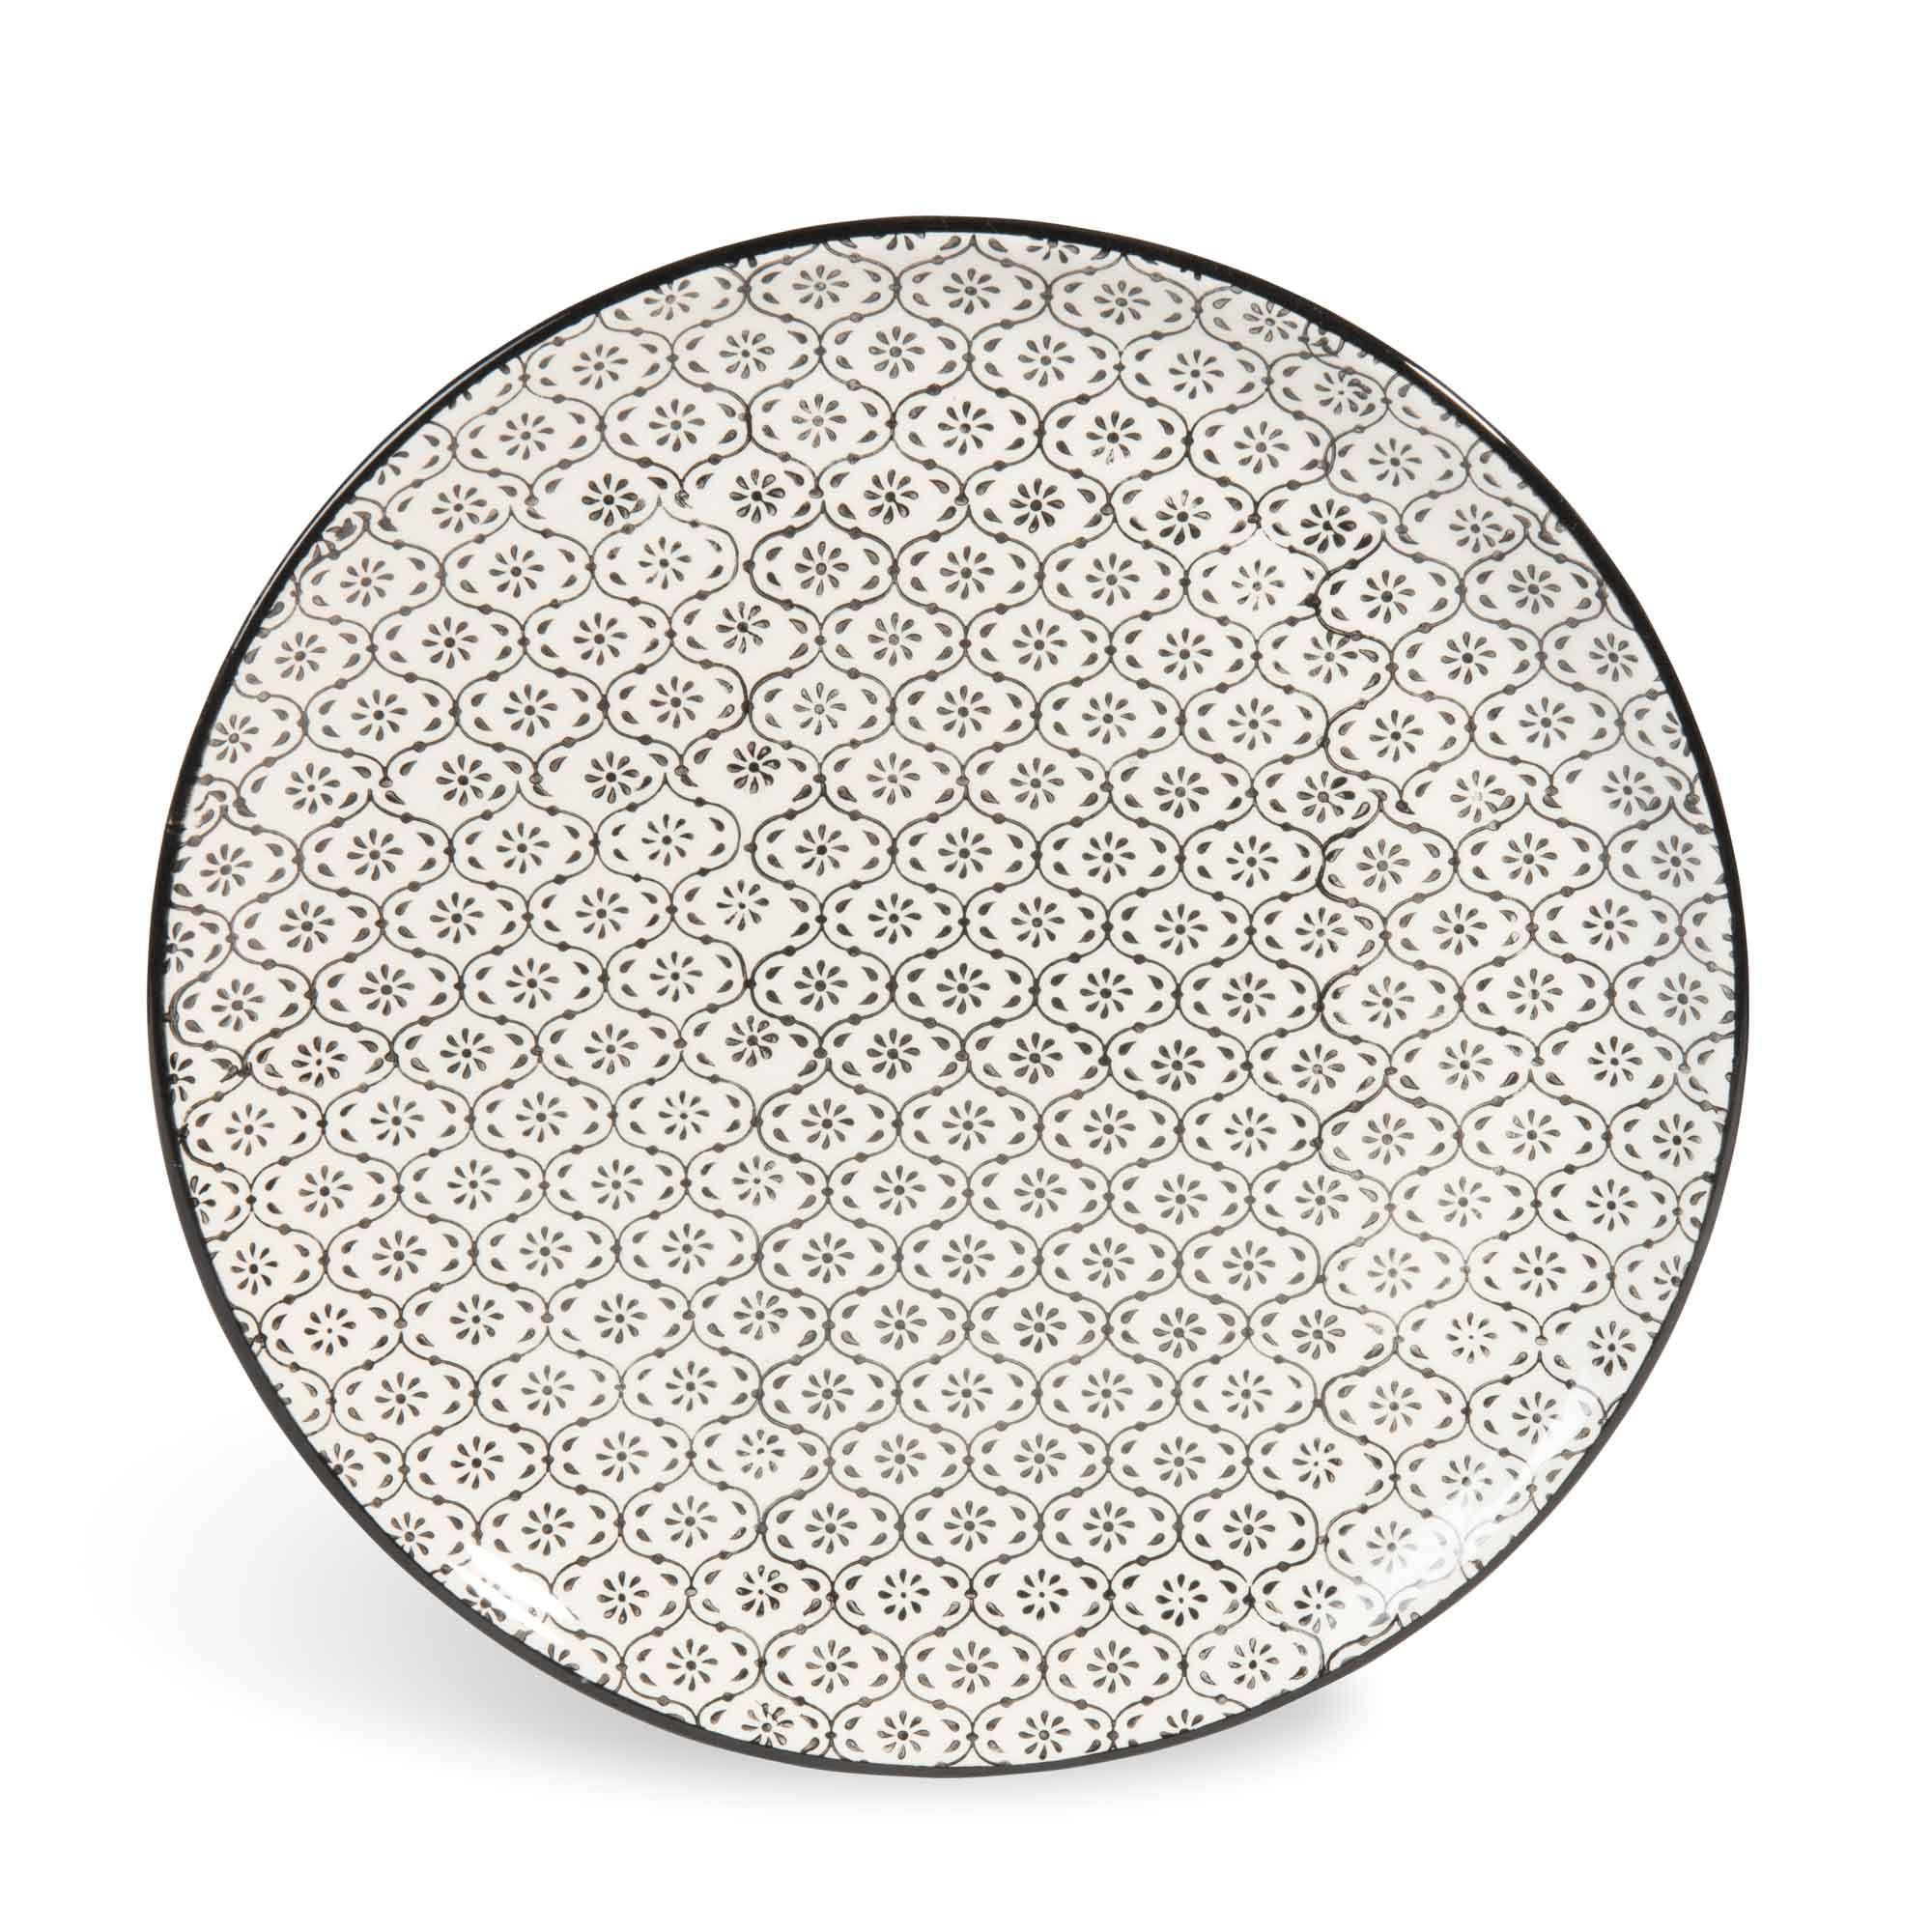 Assiette Plate En Faience Micromotif Noir Blanc D 27 Cm Chiang Mai Maisons Du Monde Geschirr Keramik Besteck